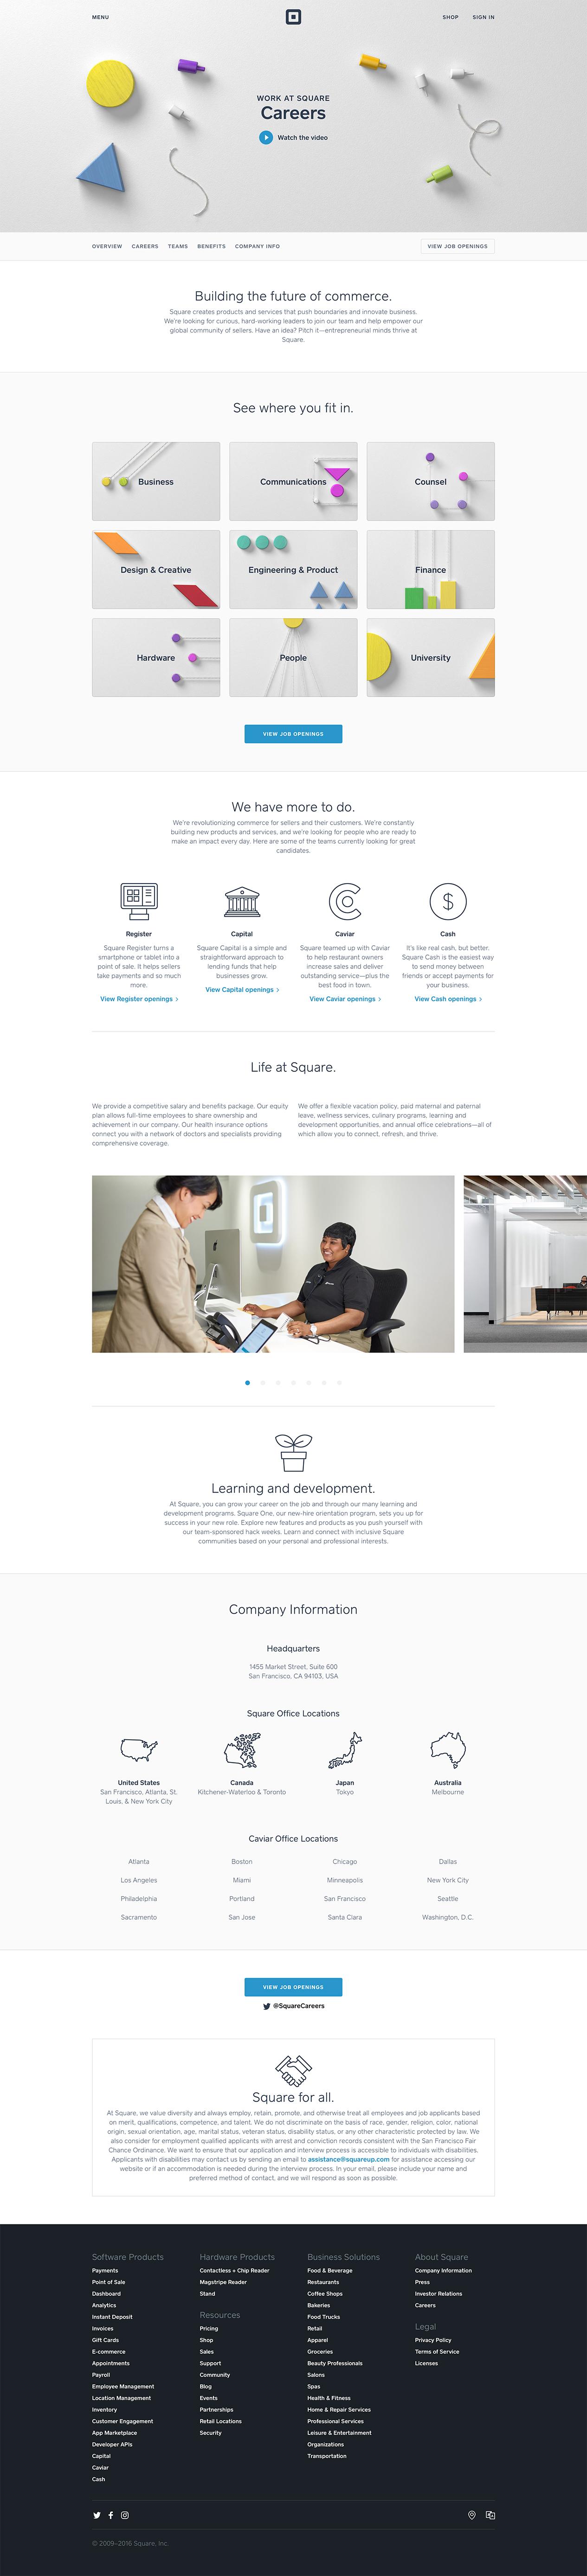 Work At Square Careers Landing Page Design Inspiration Lapa Ninja Web Design Inspiration Ecommerce Website Inspiration Best Landing Page Design